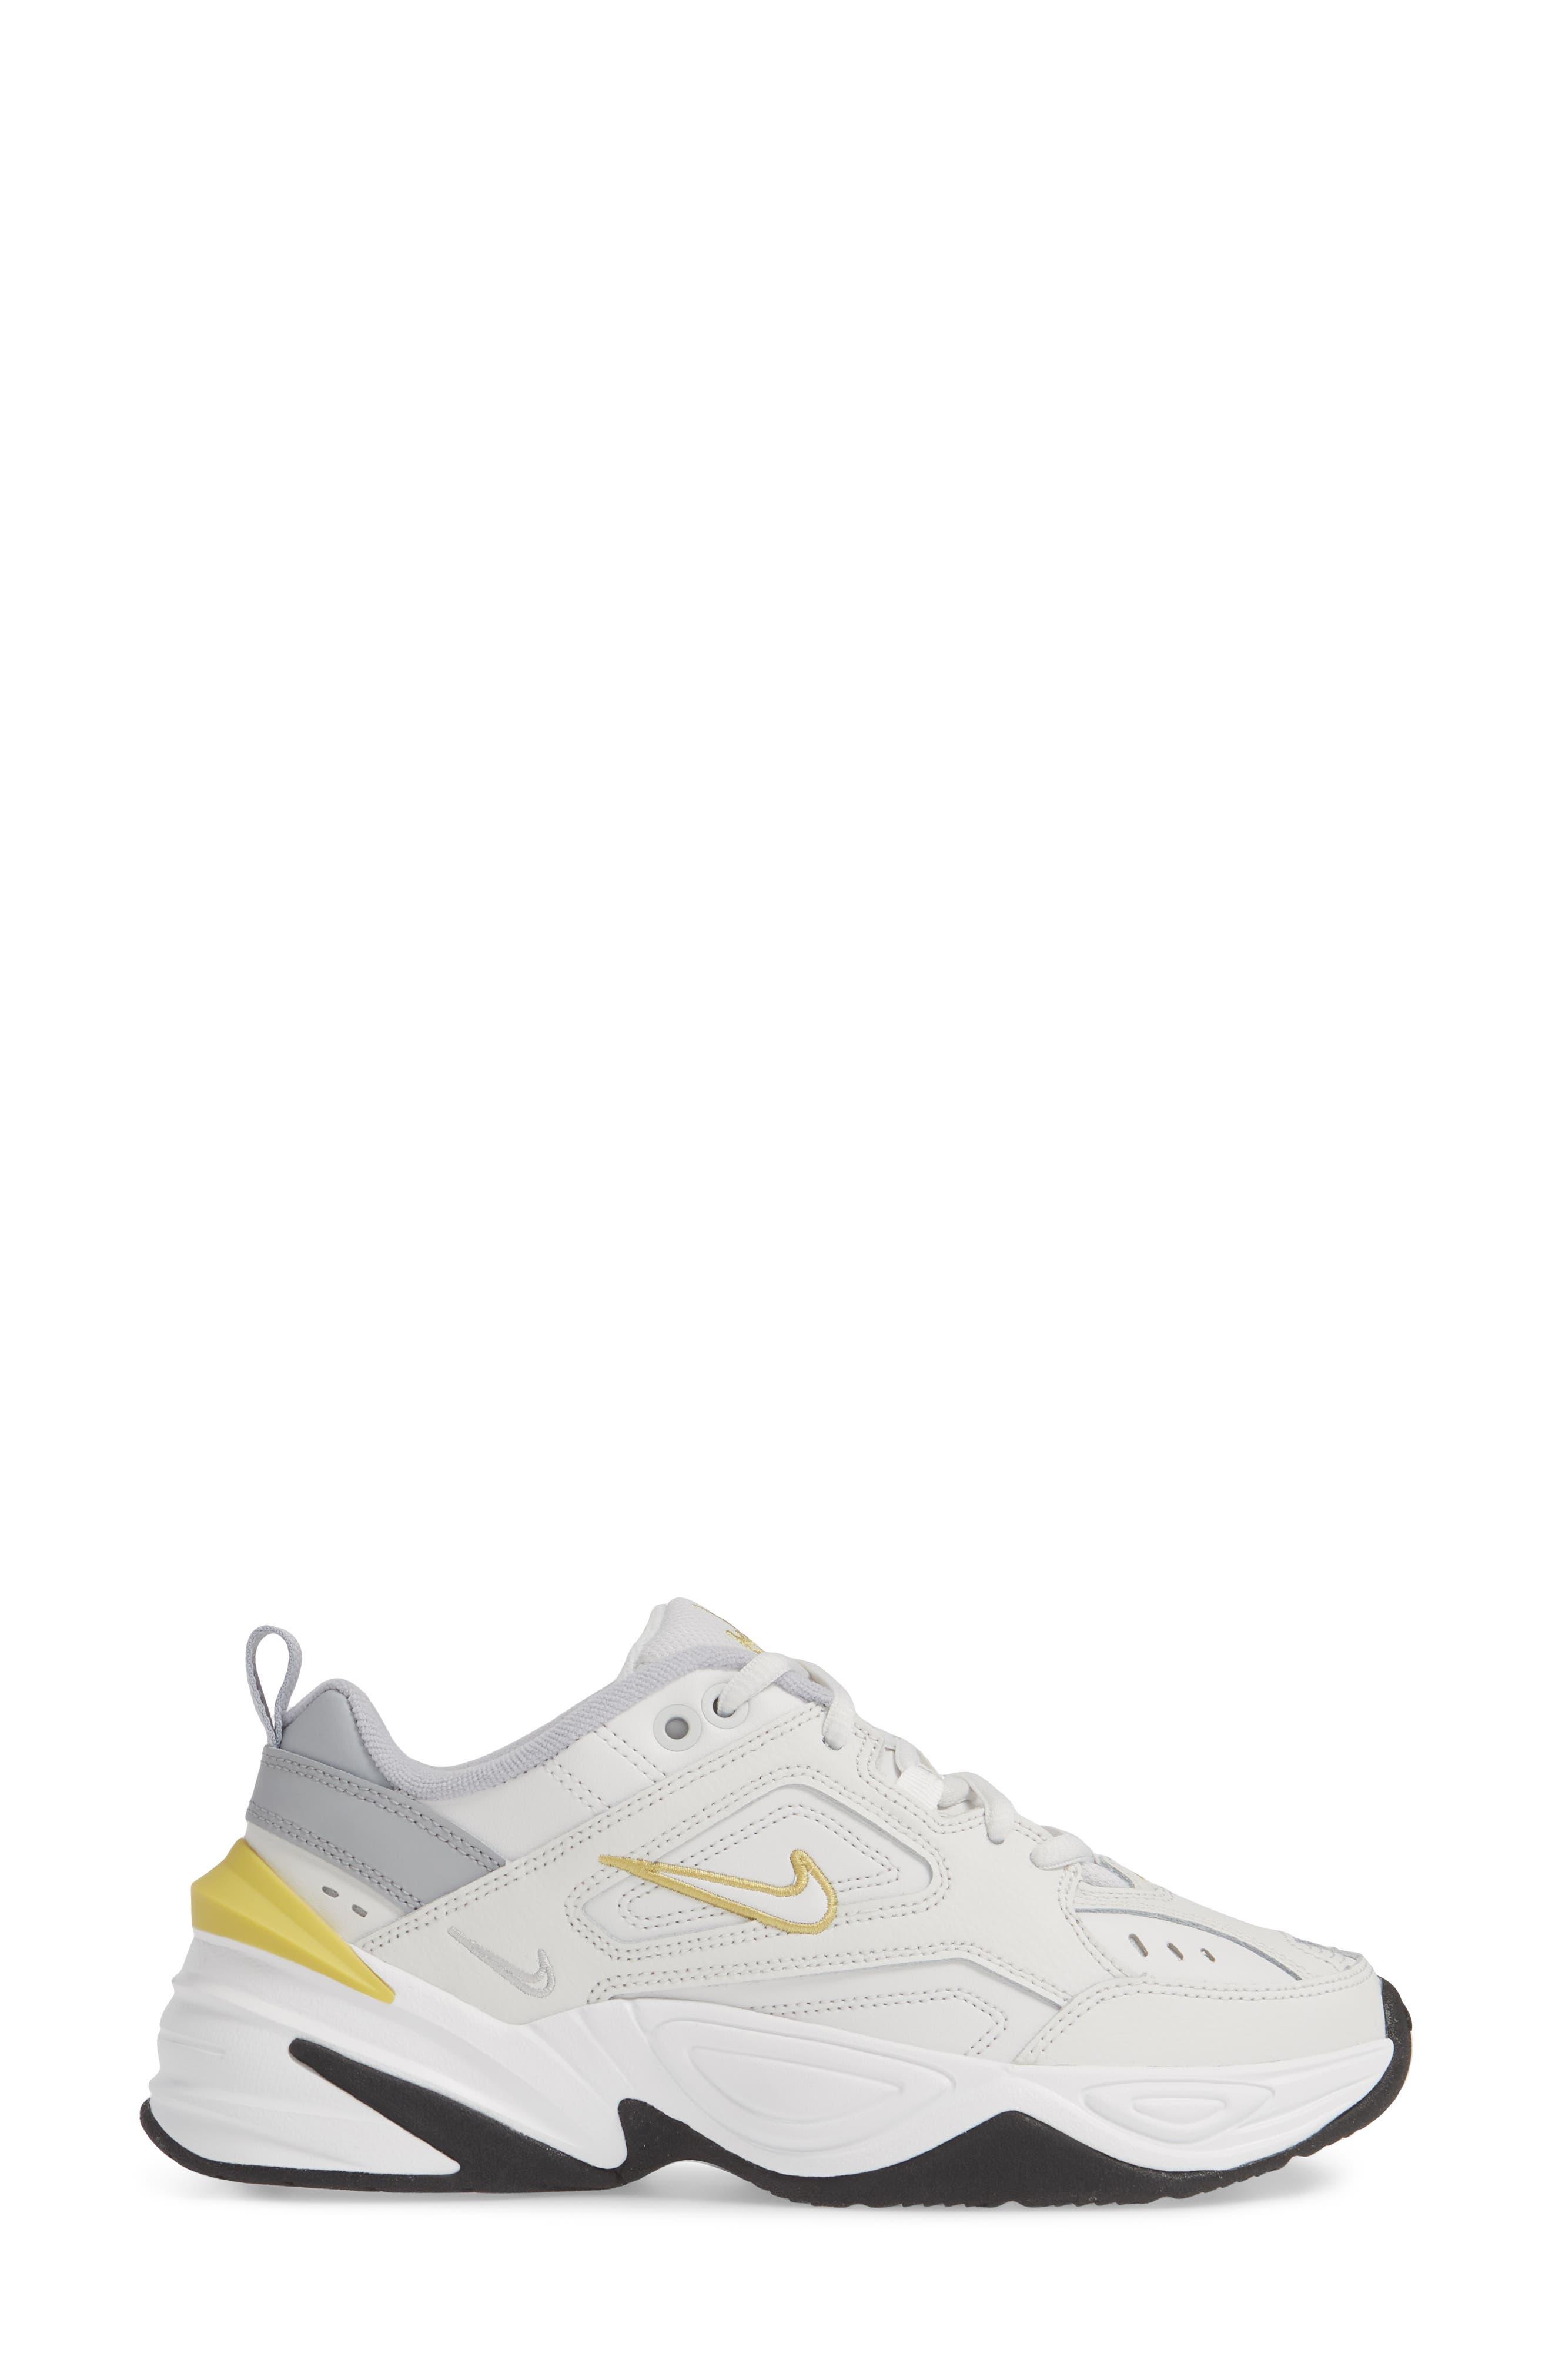 M2K Tekno Sneaker,                             Alternate thumbnail 3, color,                             PLATINUM TINT/ CELERY/ GREY